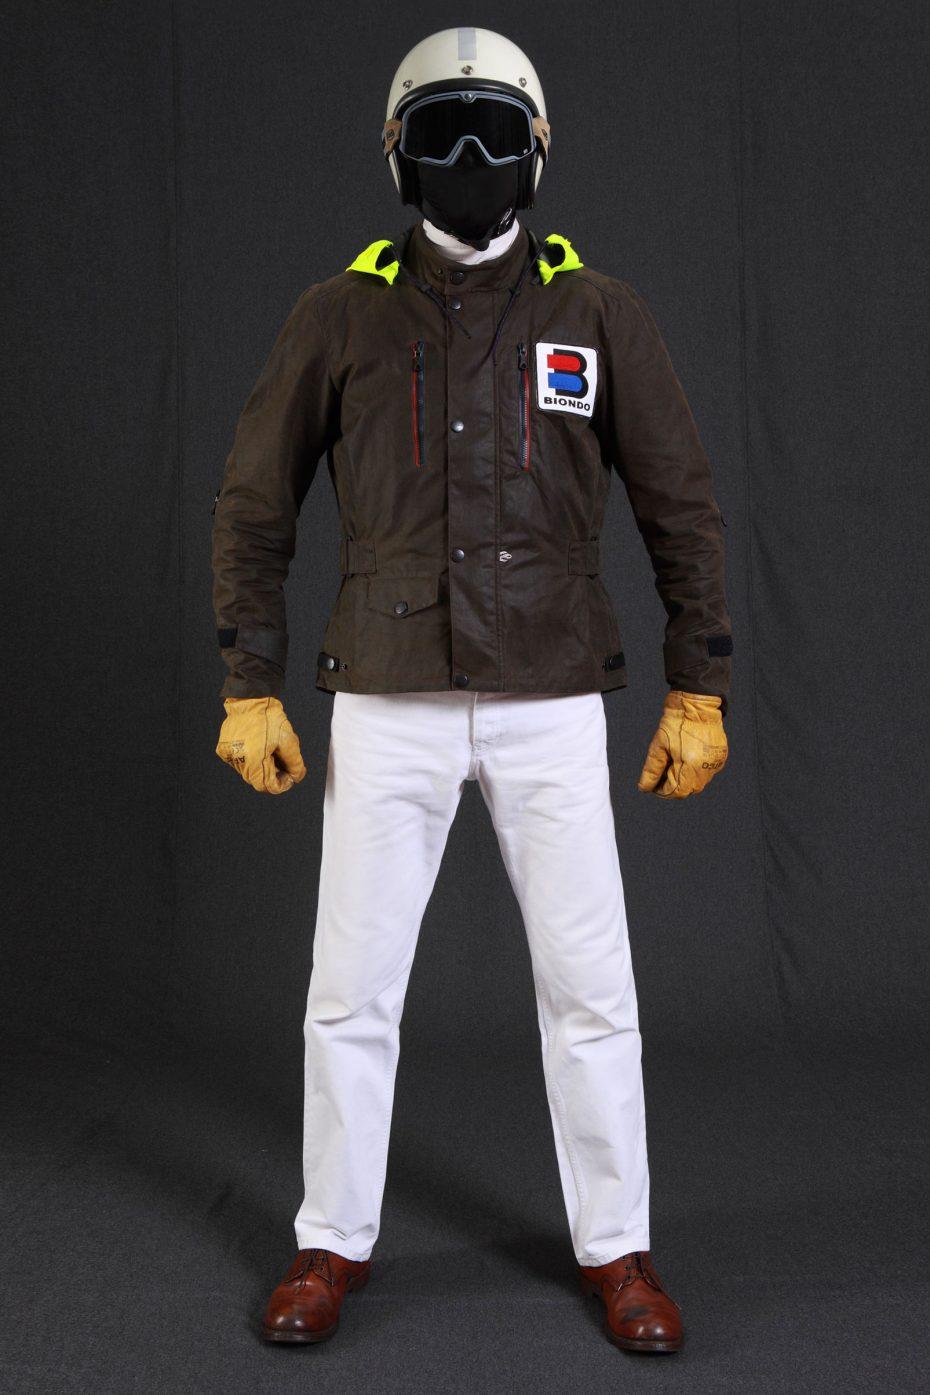 BiondoEndurance_Motorräder_GB_0014_Jacket-Mid-MkII_KhakiBrown_Portrait_Front